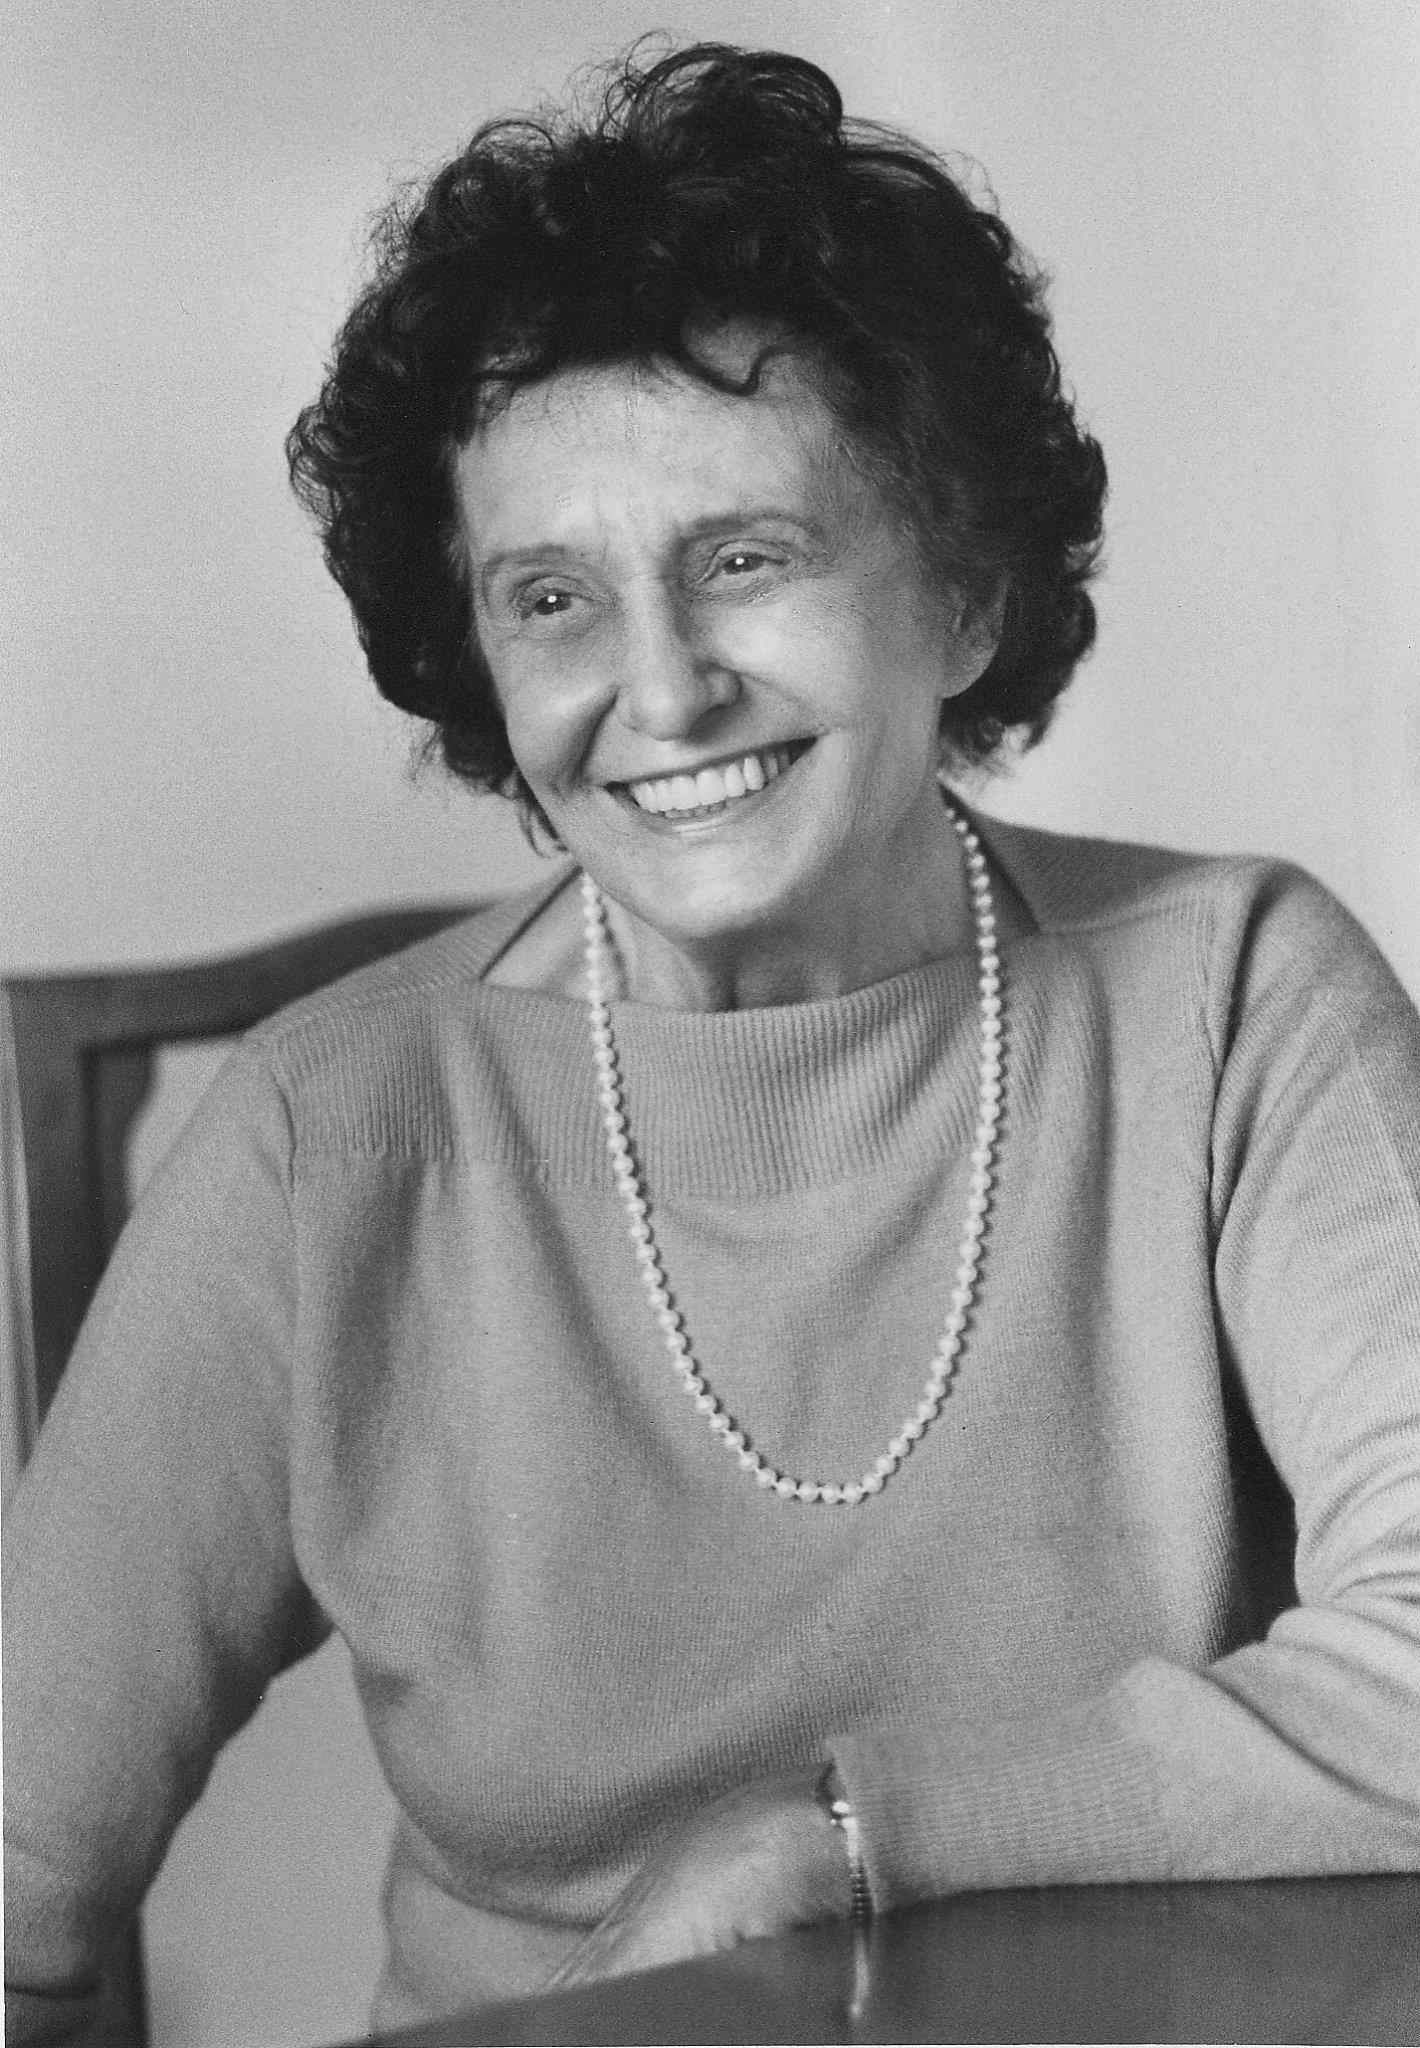 Alma Muriel Fotos muriel james, self-help psychologist, author of 'born to win